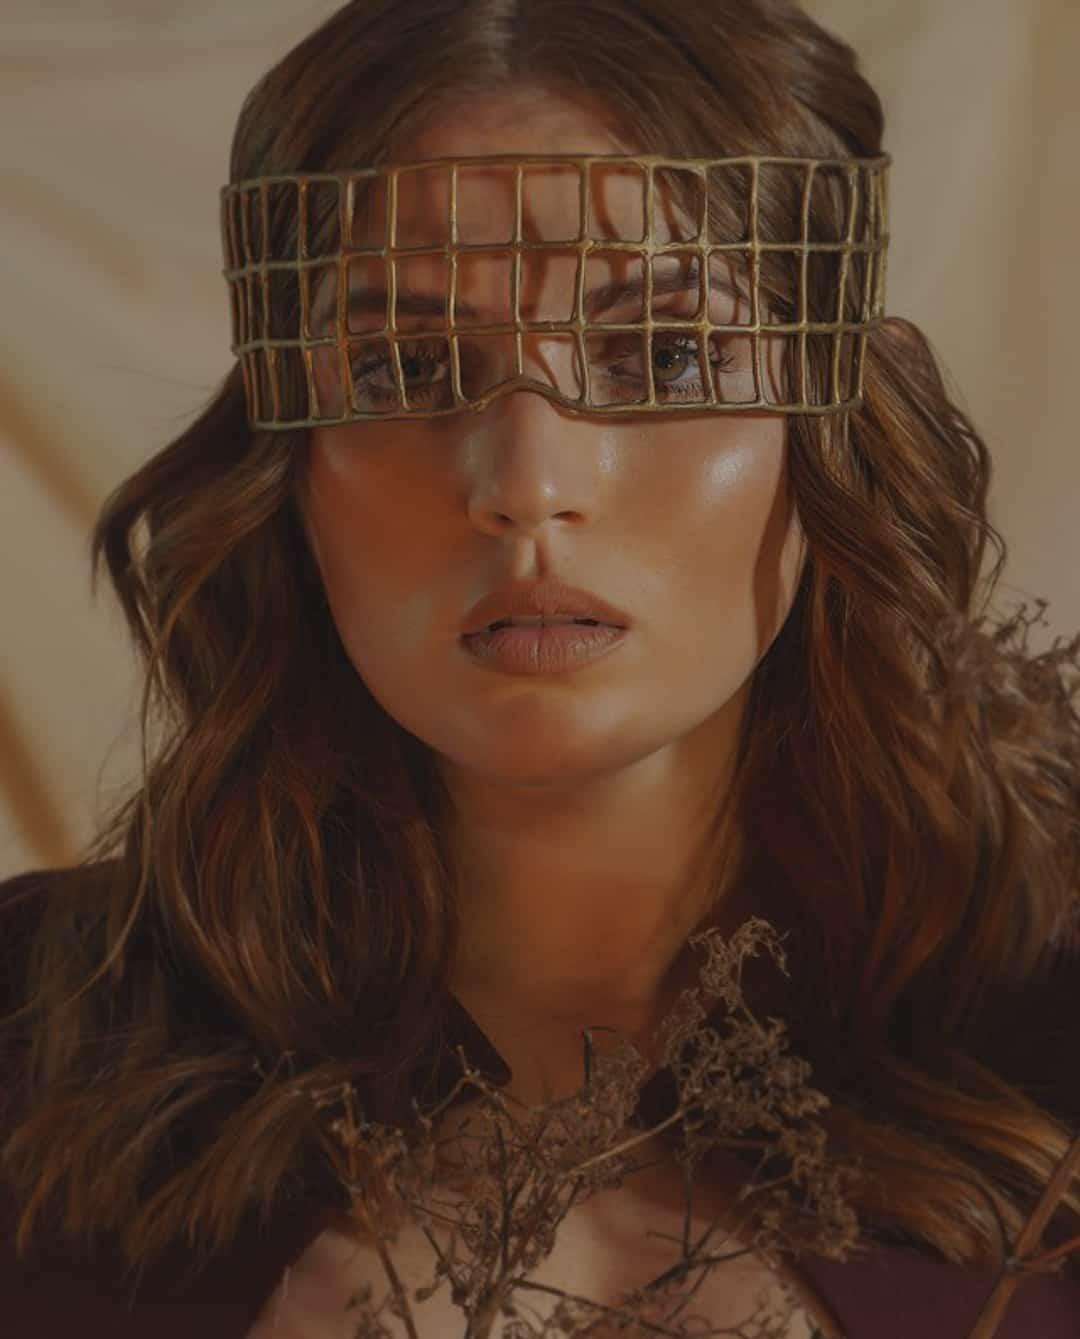 Golden throne face mask